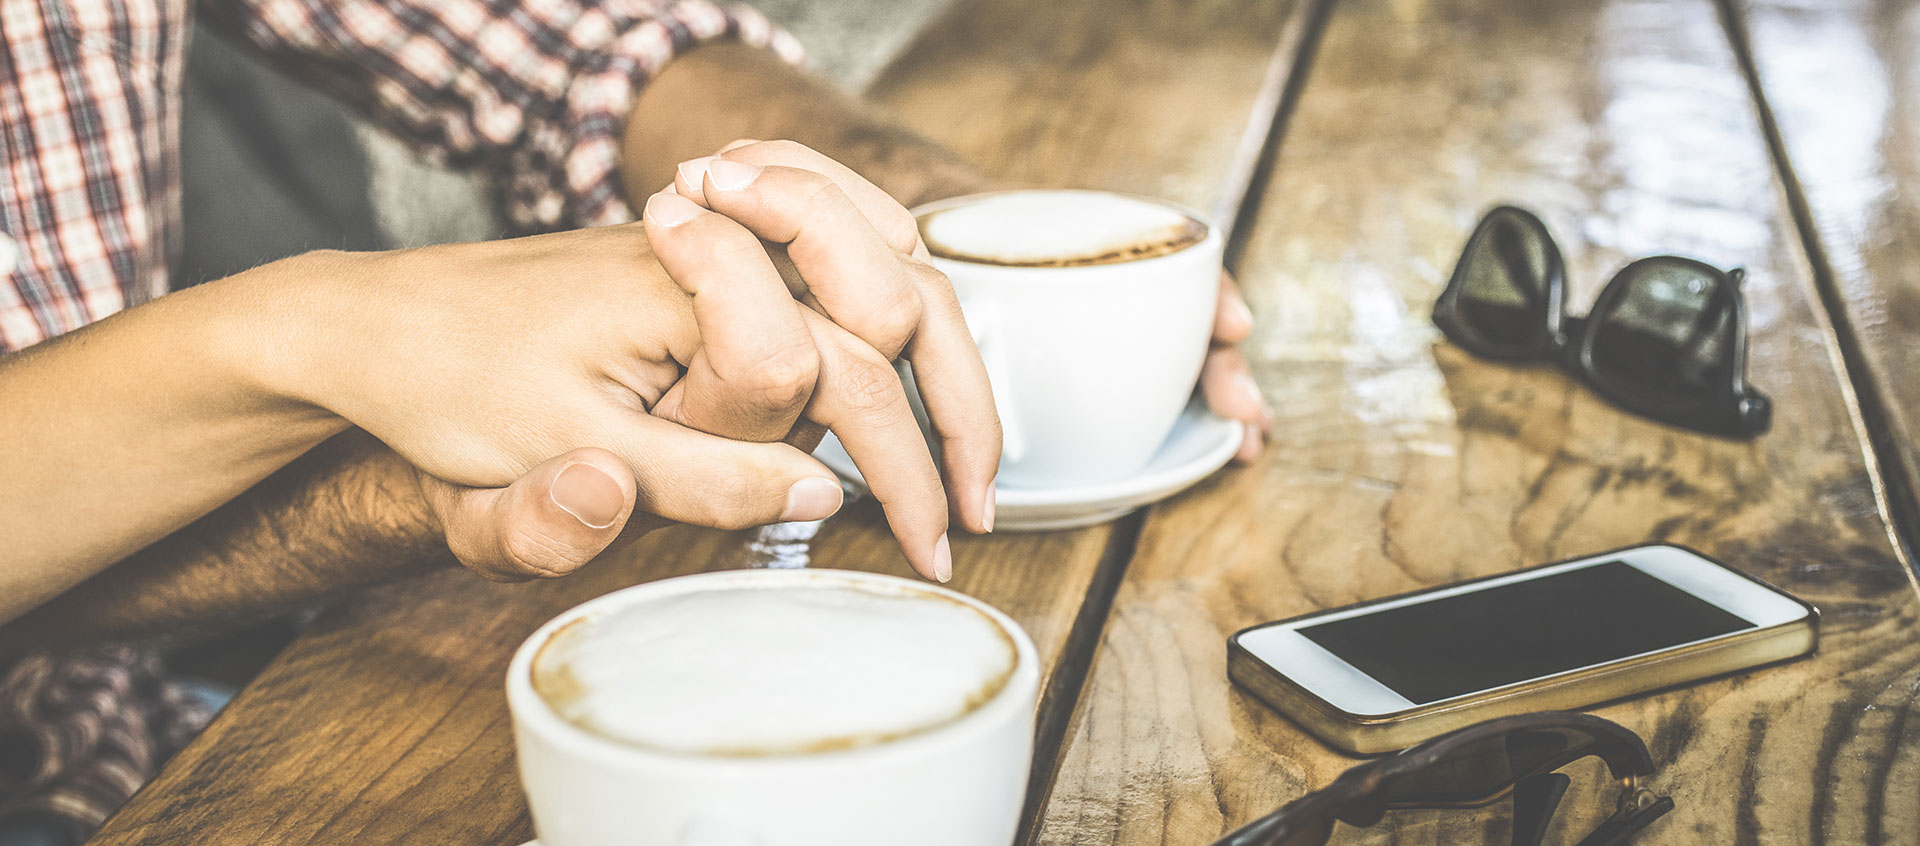 Dating for Your Dosha | Kripalu